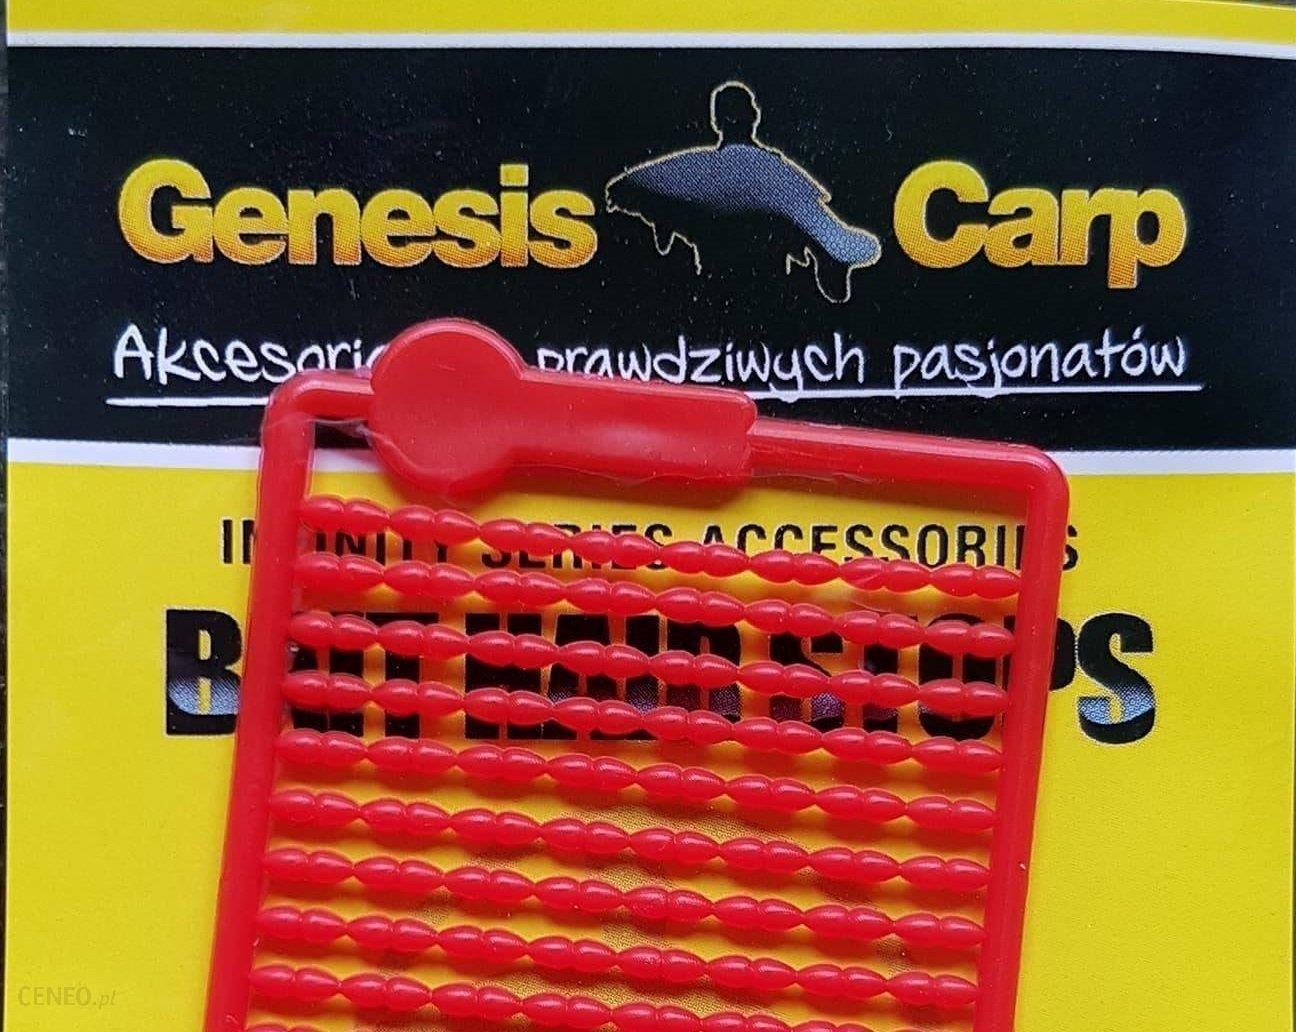 Genesis Carp Stopery Do Kulek I Pelletu 1Szt Red